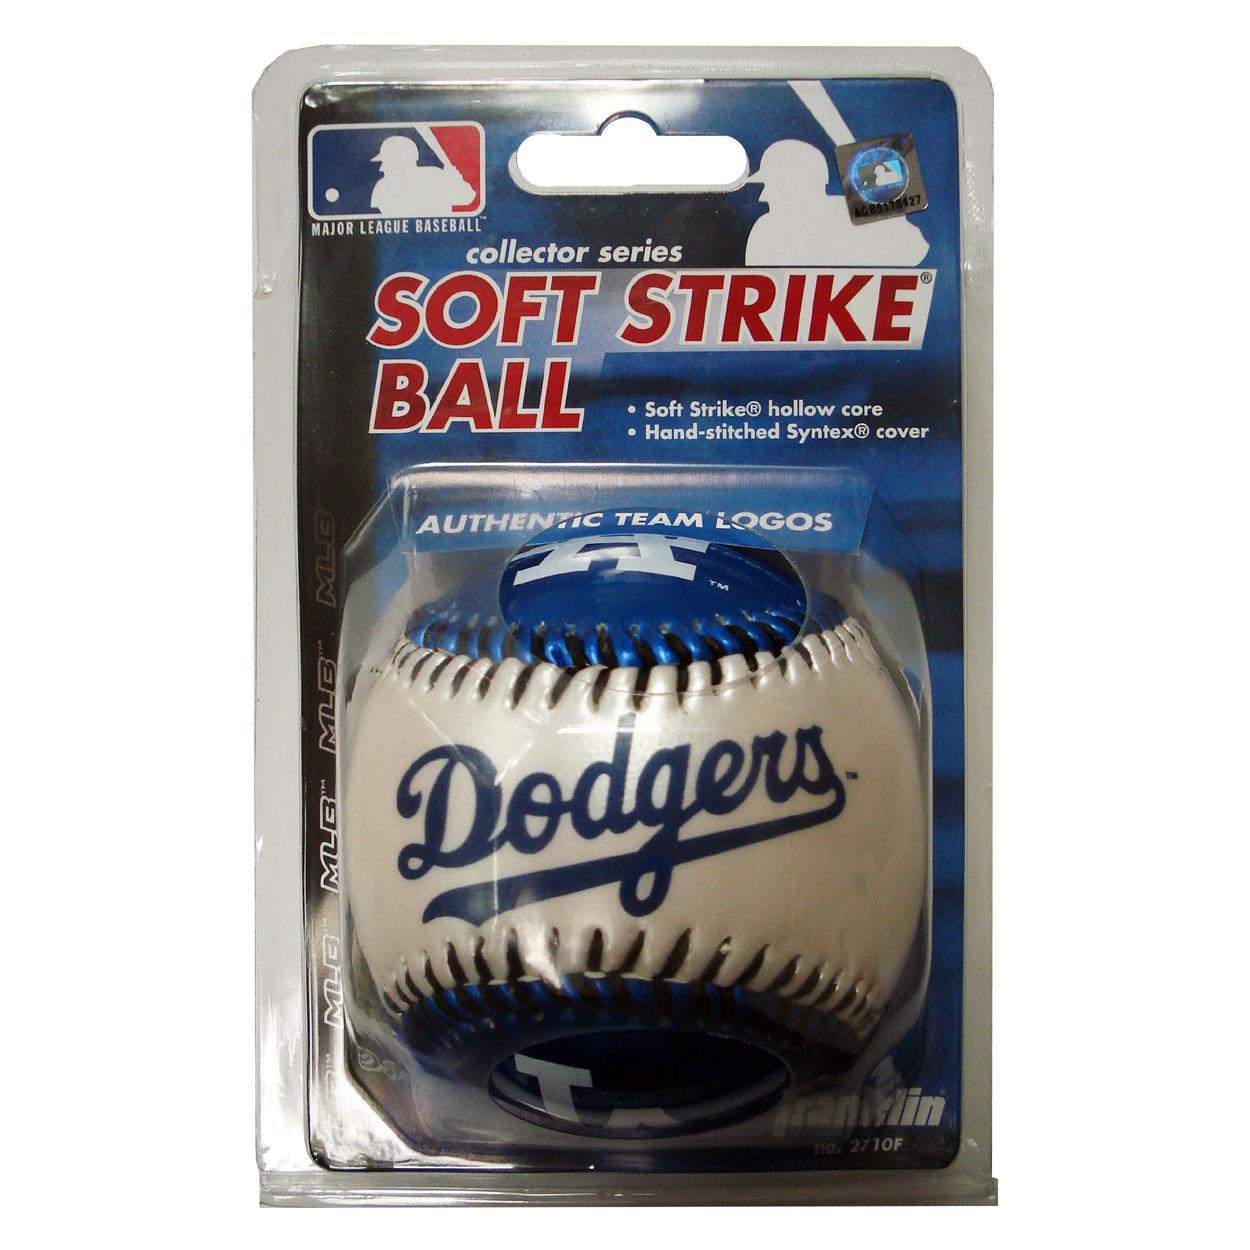 Franklin Soft Strike Baseball - Los Angeles Dodgers Los Angeles Dodgers FRANBBLADBB